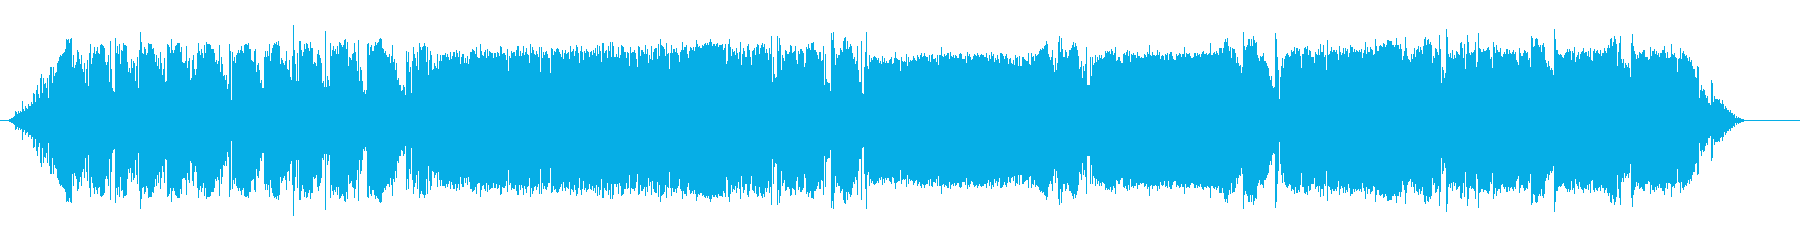 FIA GTカー;アイドル/バック...の再生済みの波形